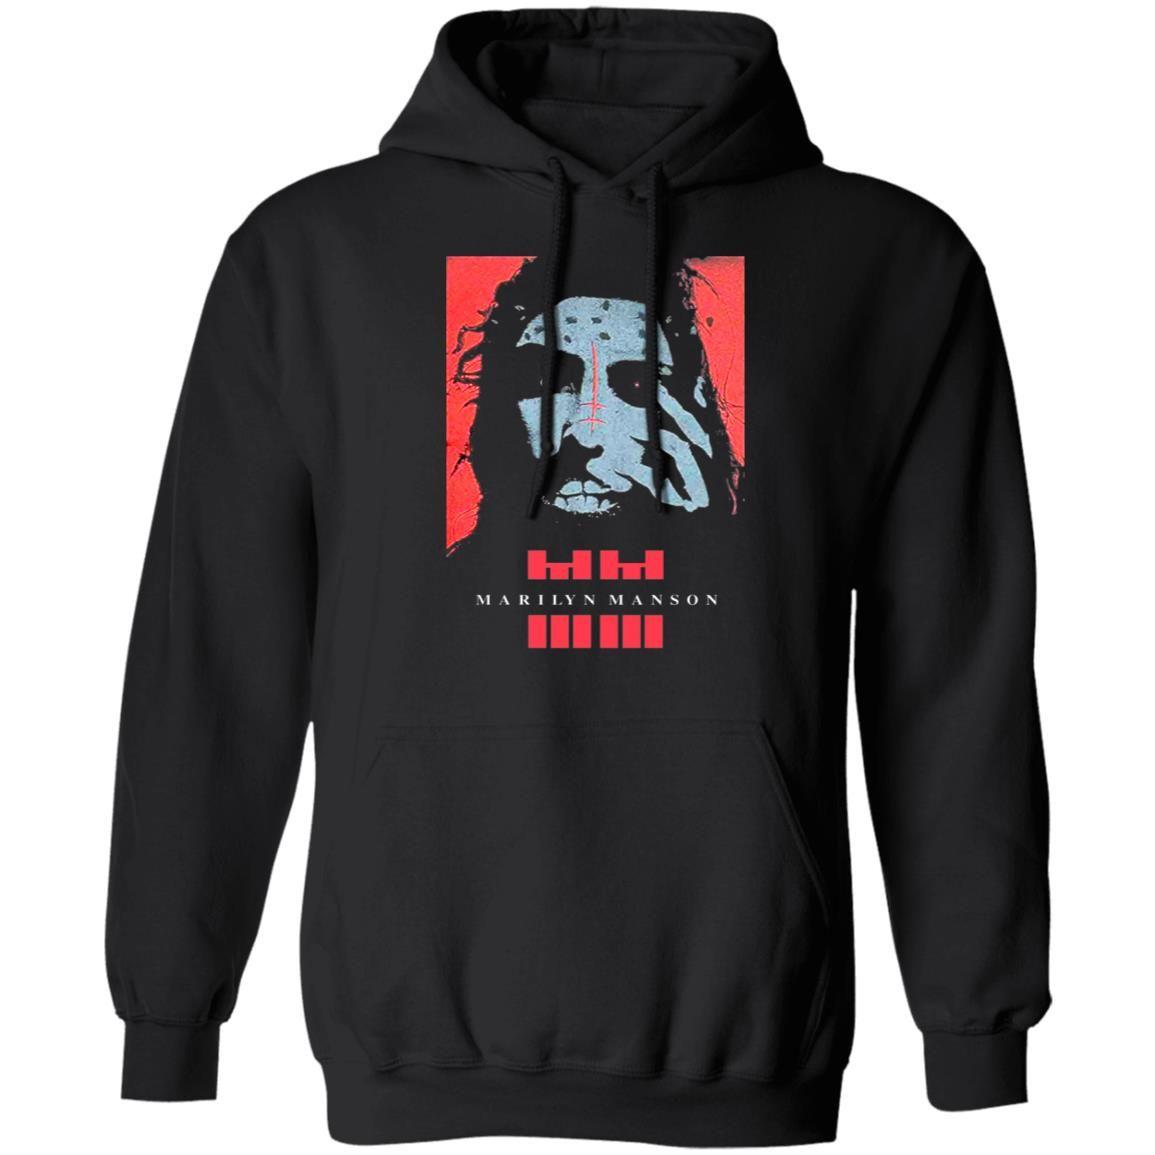 Marilyn Manson 'Rebel' Shirt